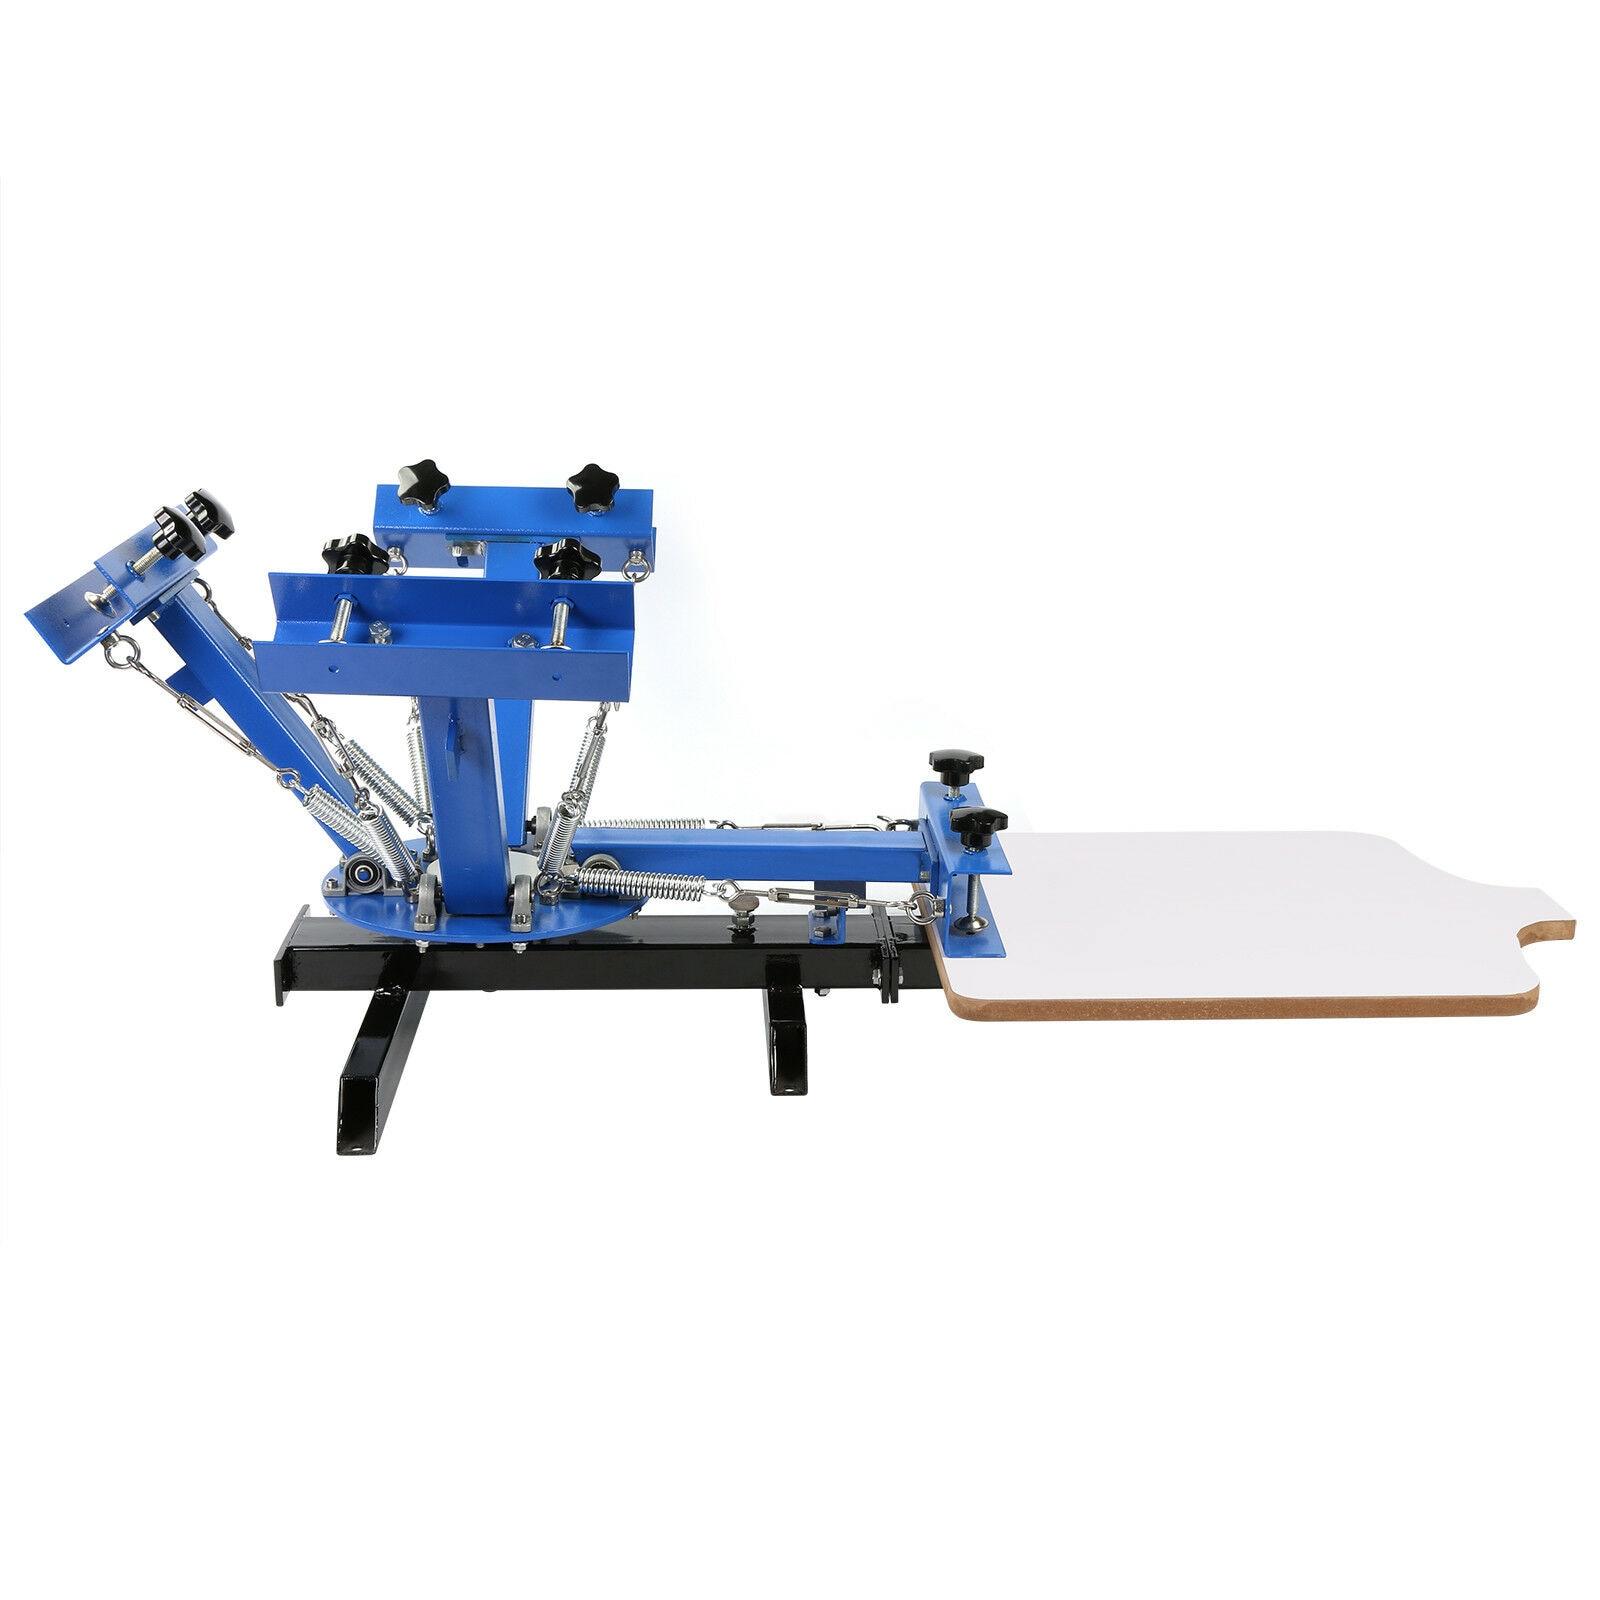 Screen Printing Machine 4 Color 1 Station Silk Screen Printing Press For T-Shirt DIY Printing With Removable Pallet enlarge